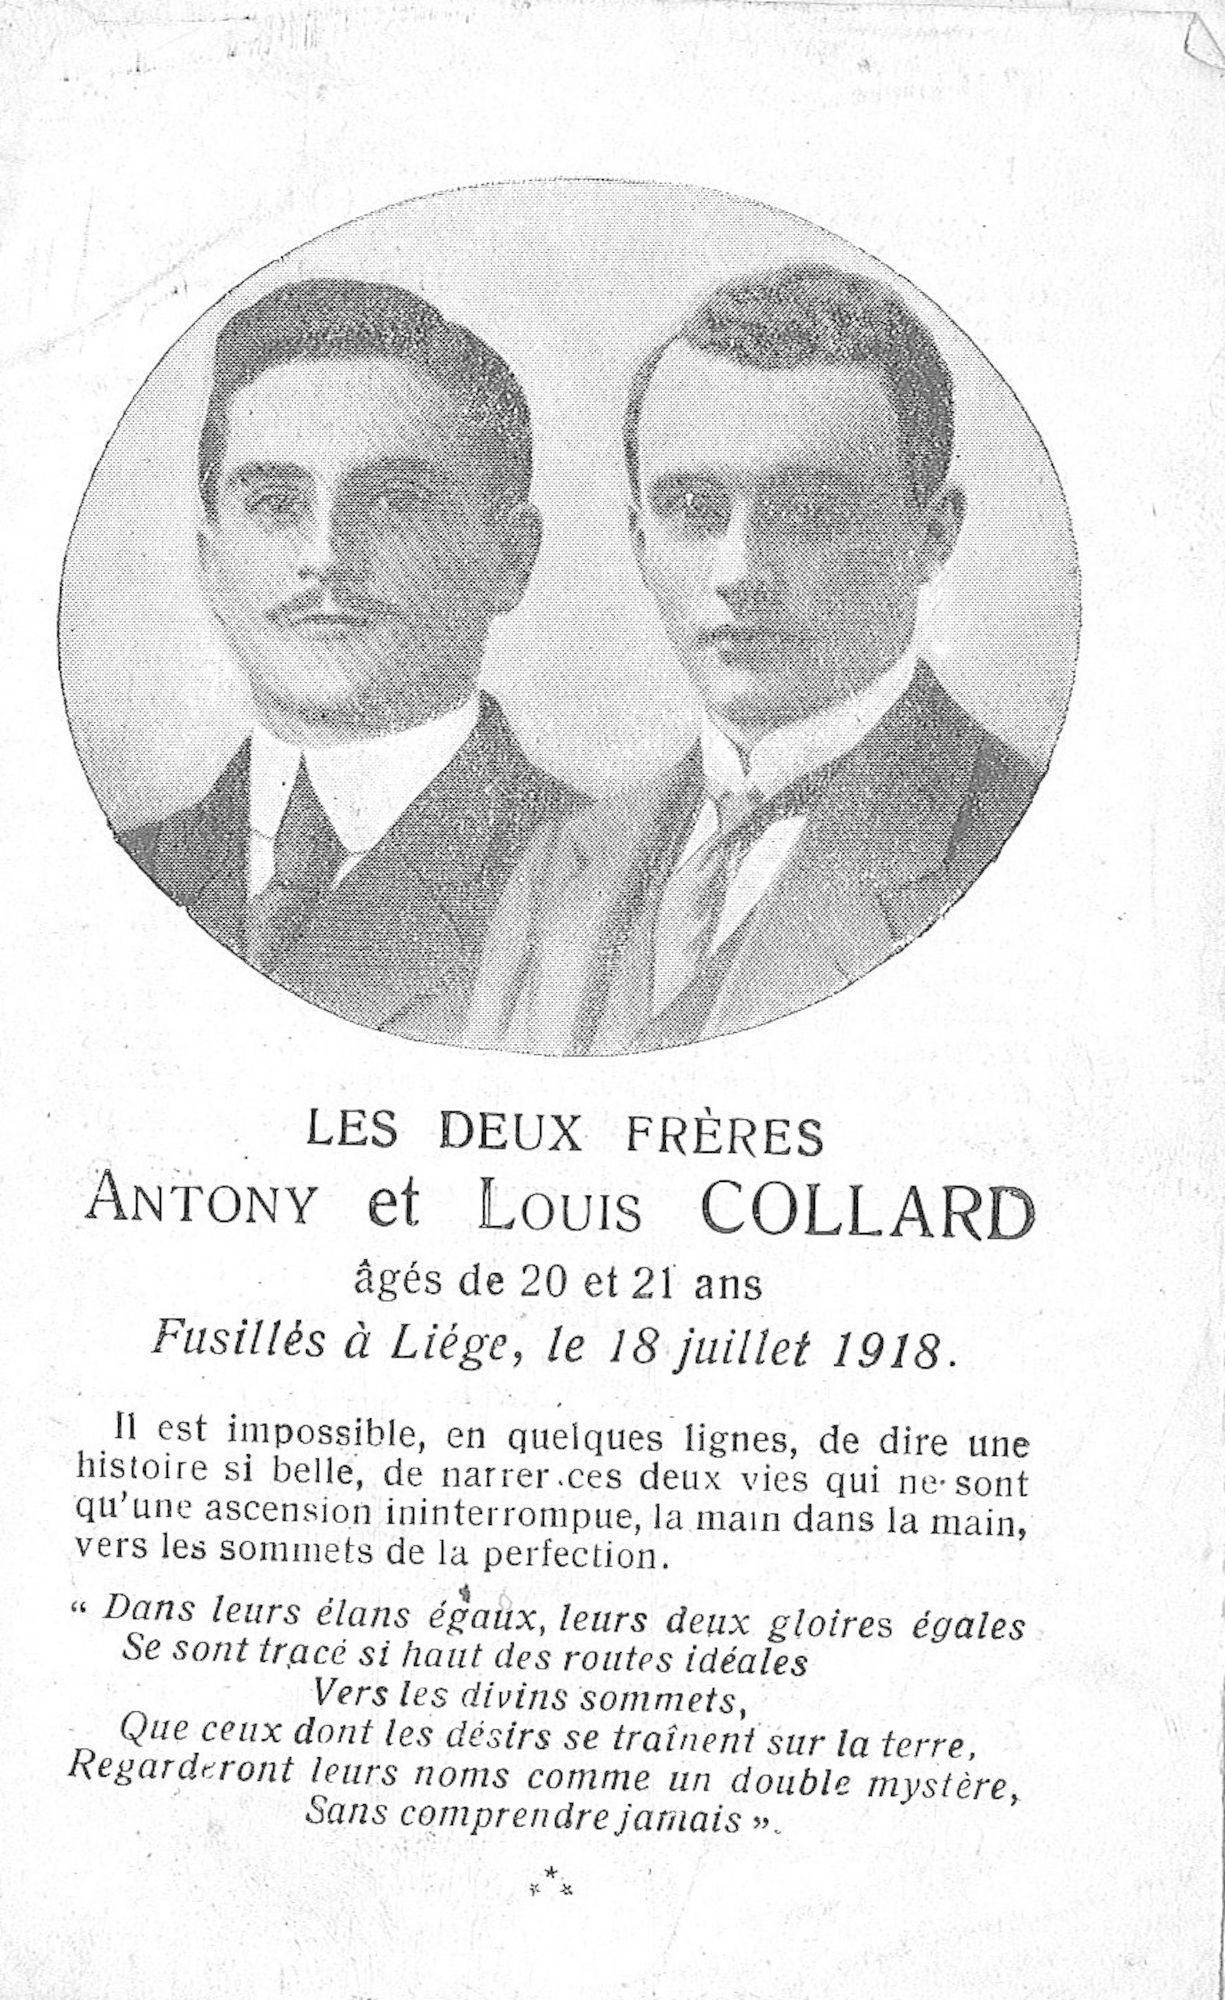 Antony Collard